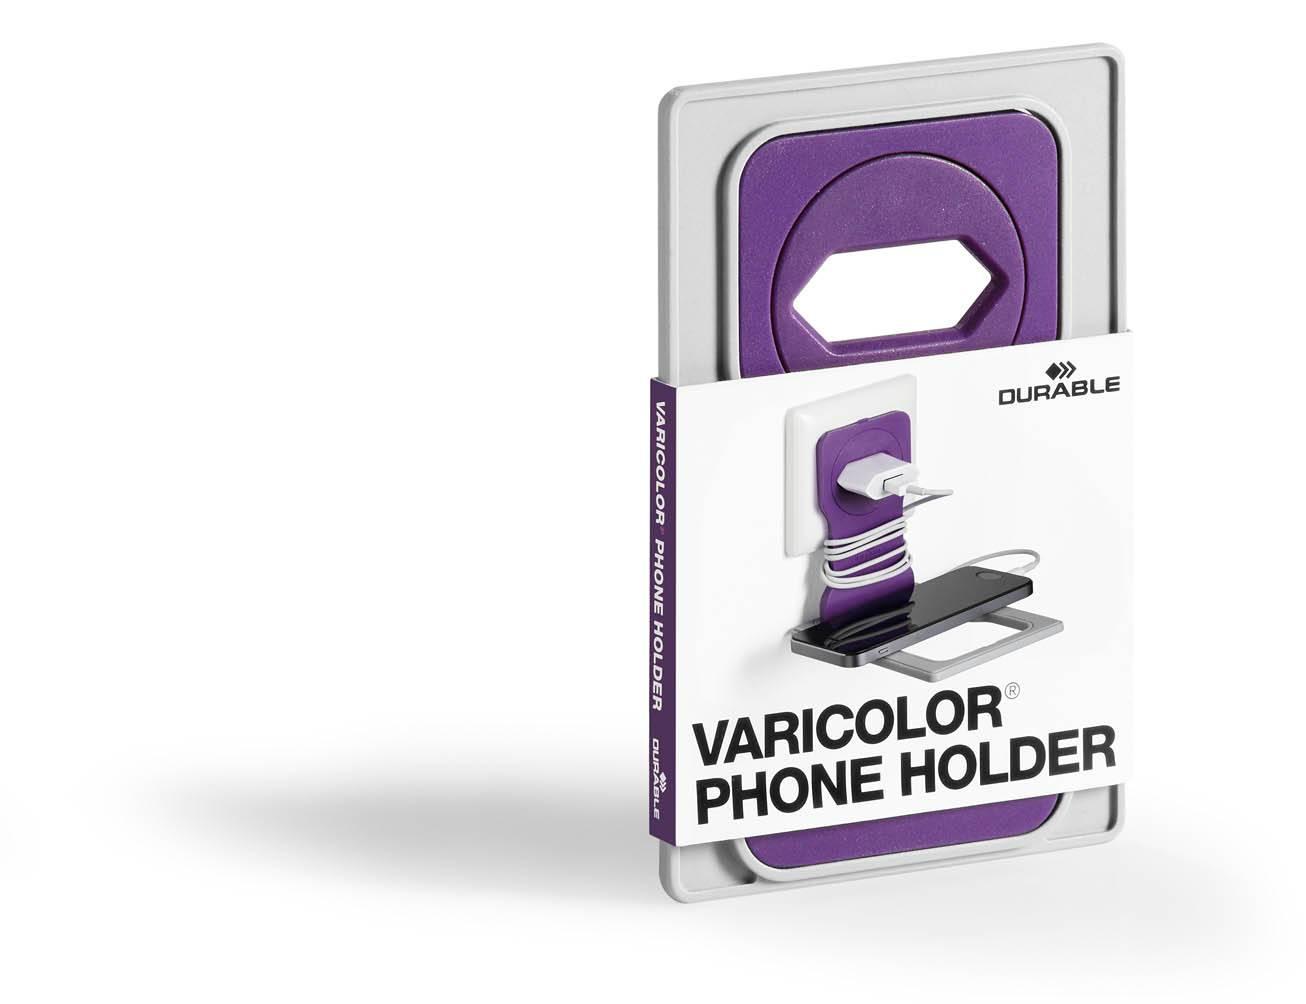 Подставка Durable 7735-12 Varicolor фиолетовый/серый - фото 3